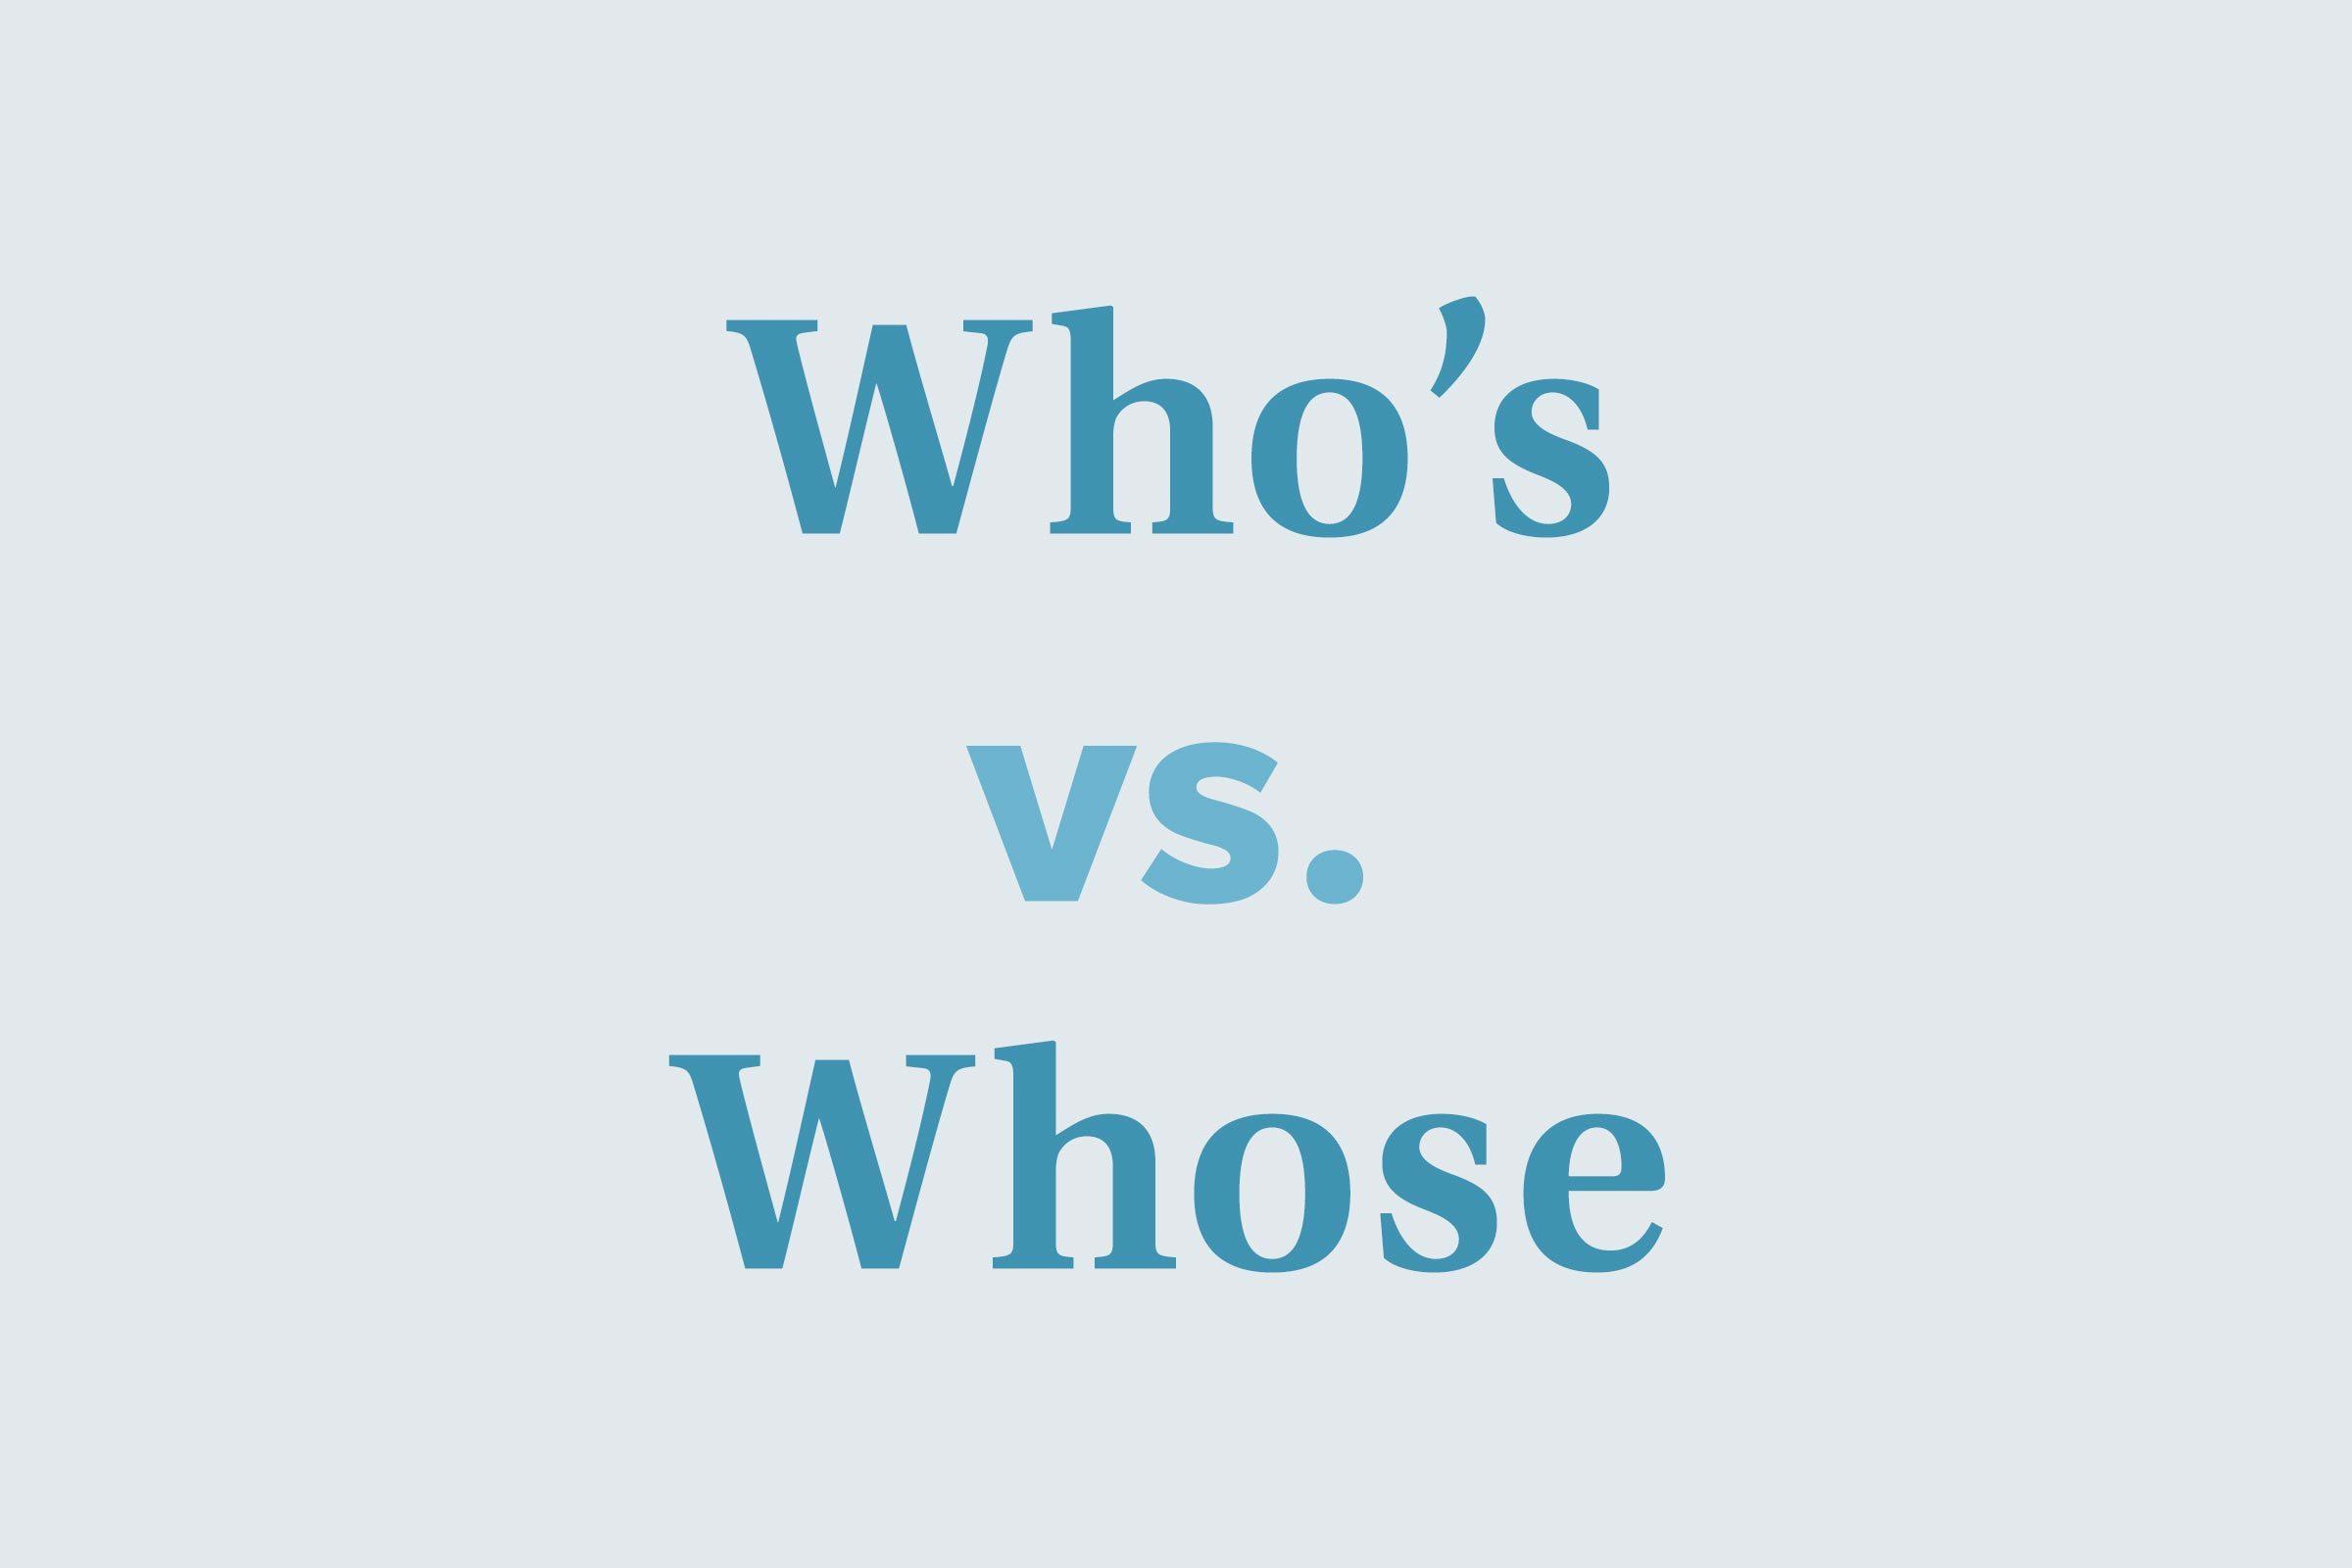 Whose vs. who's